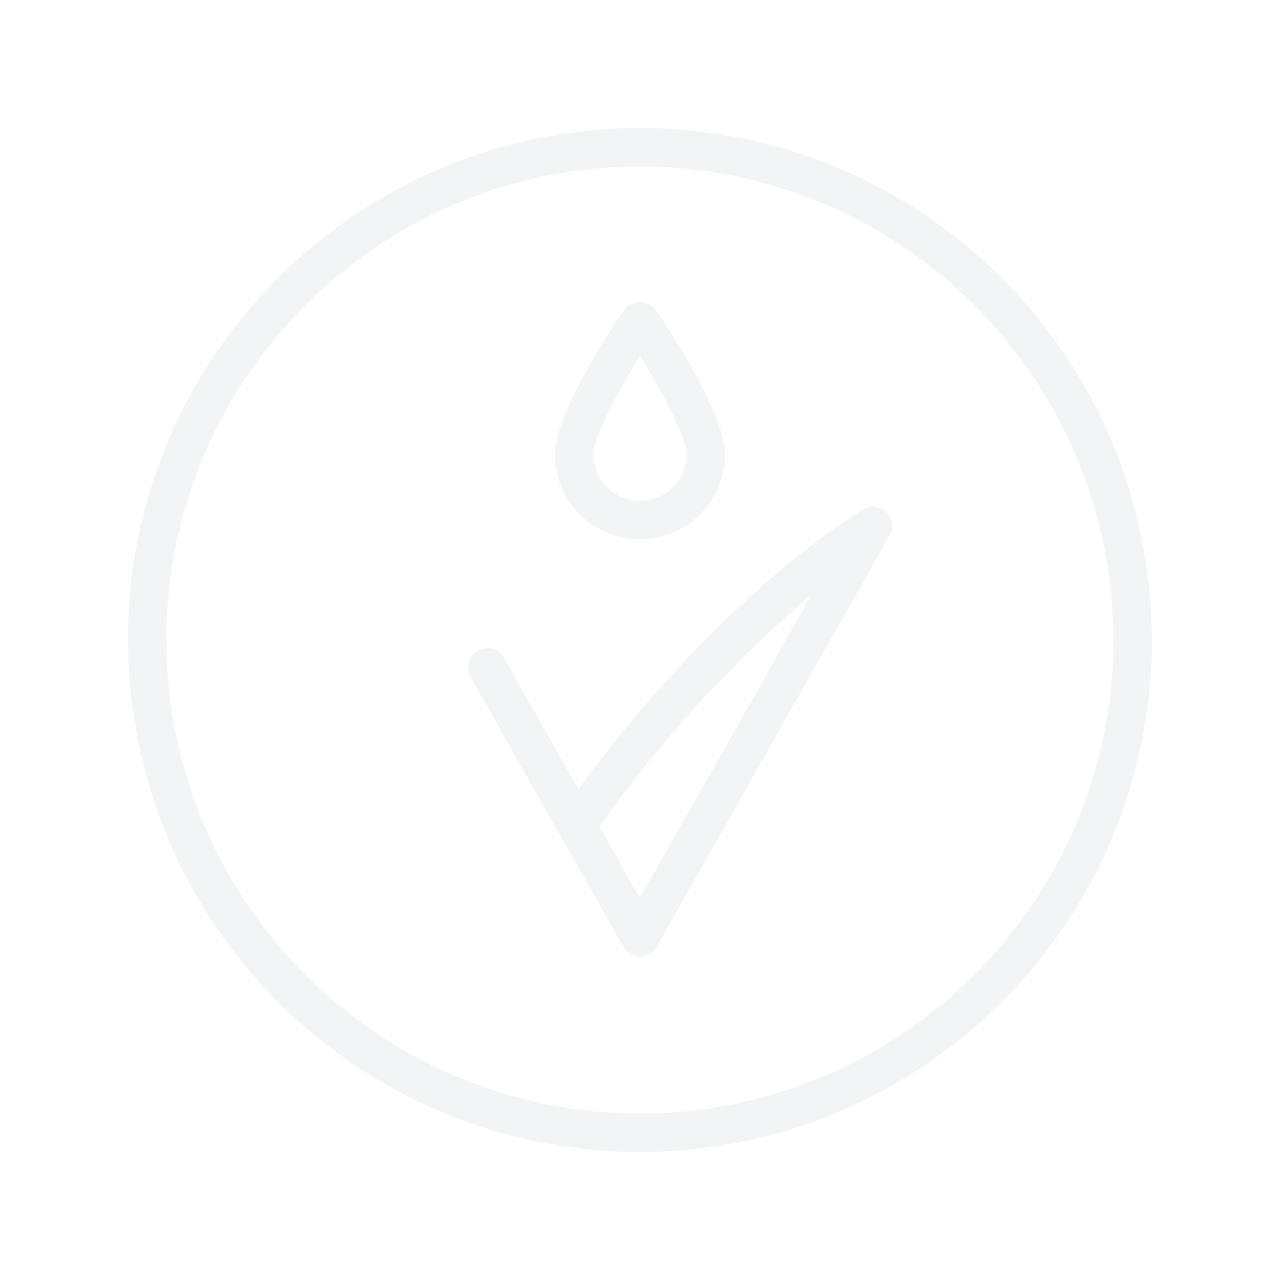 MISSHA Time Revolution Vitality Cream восстанавливающий крем 50ml